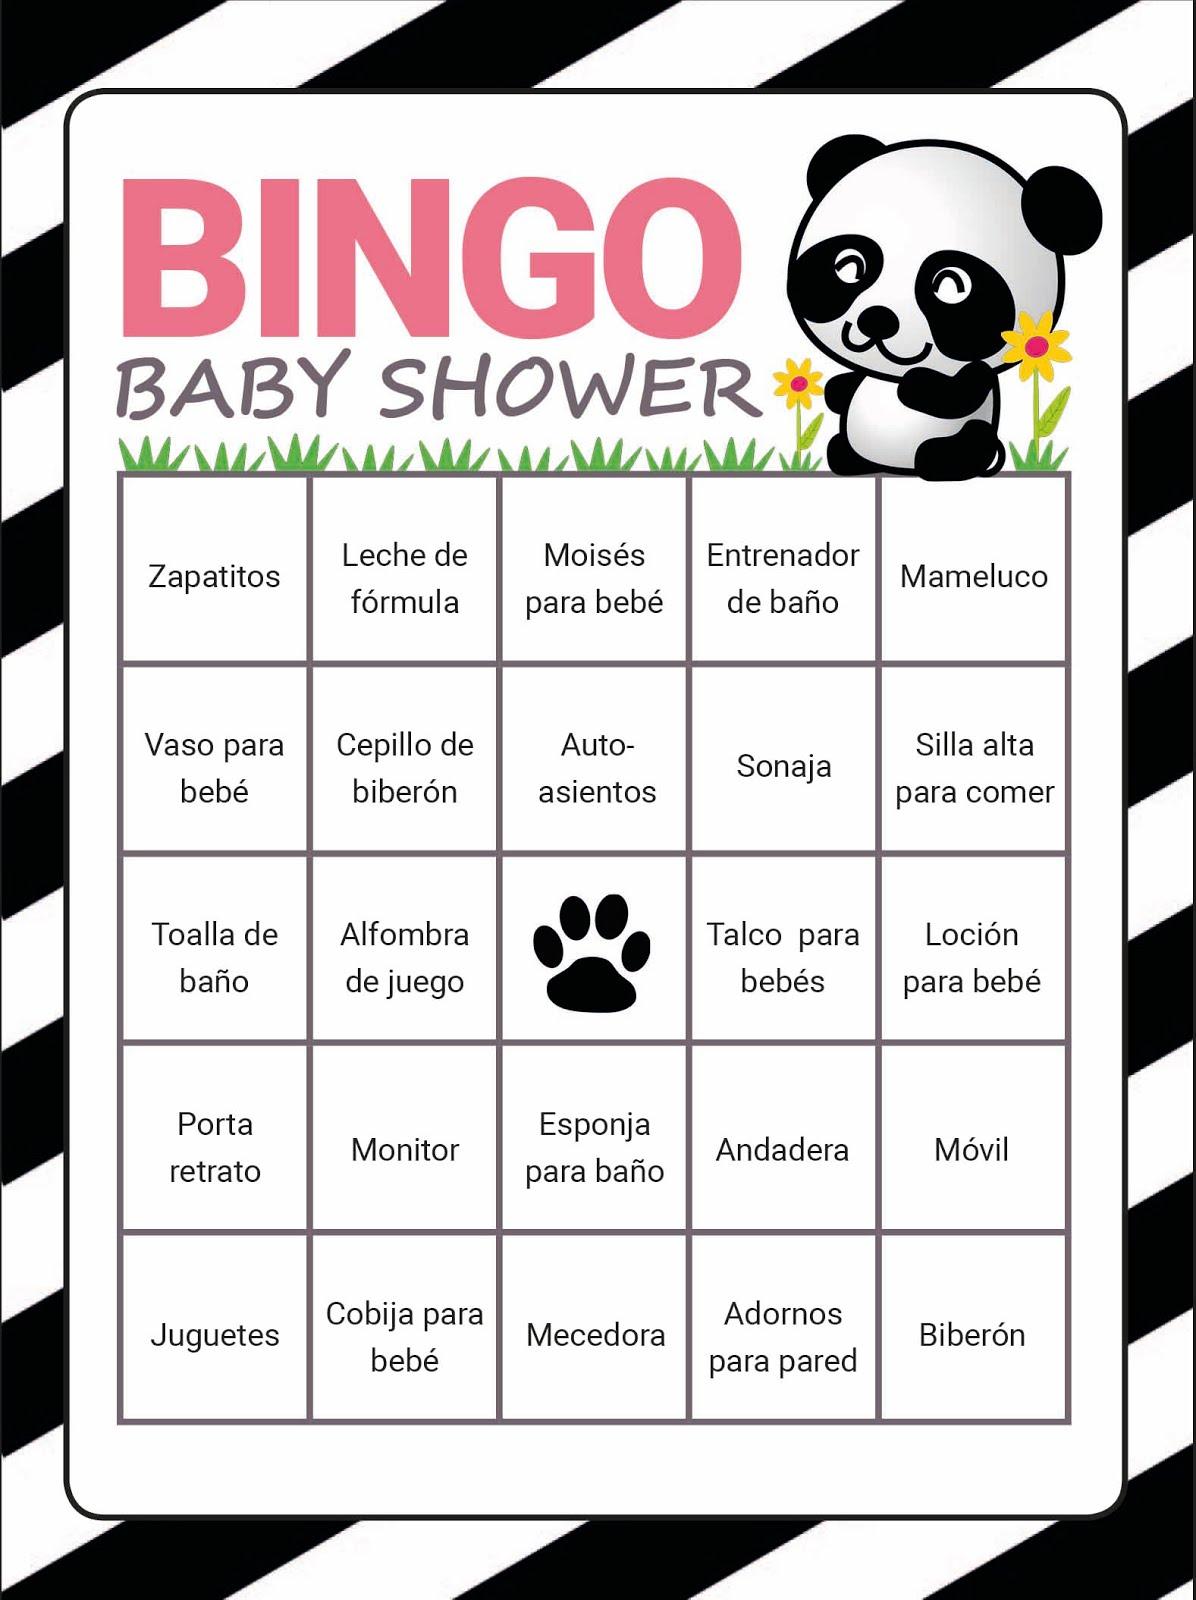 ¡Bingo para Baby shower!